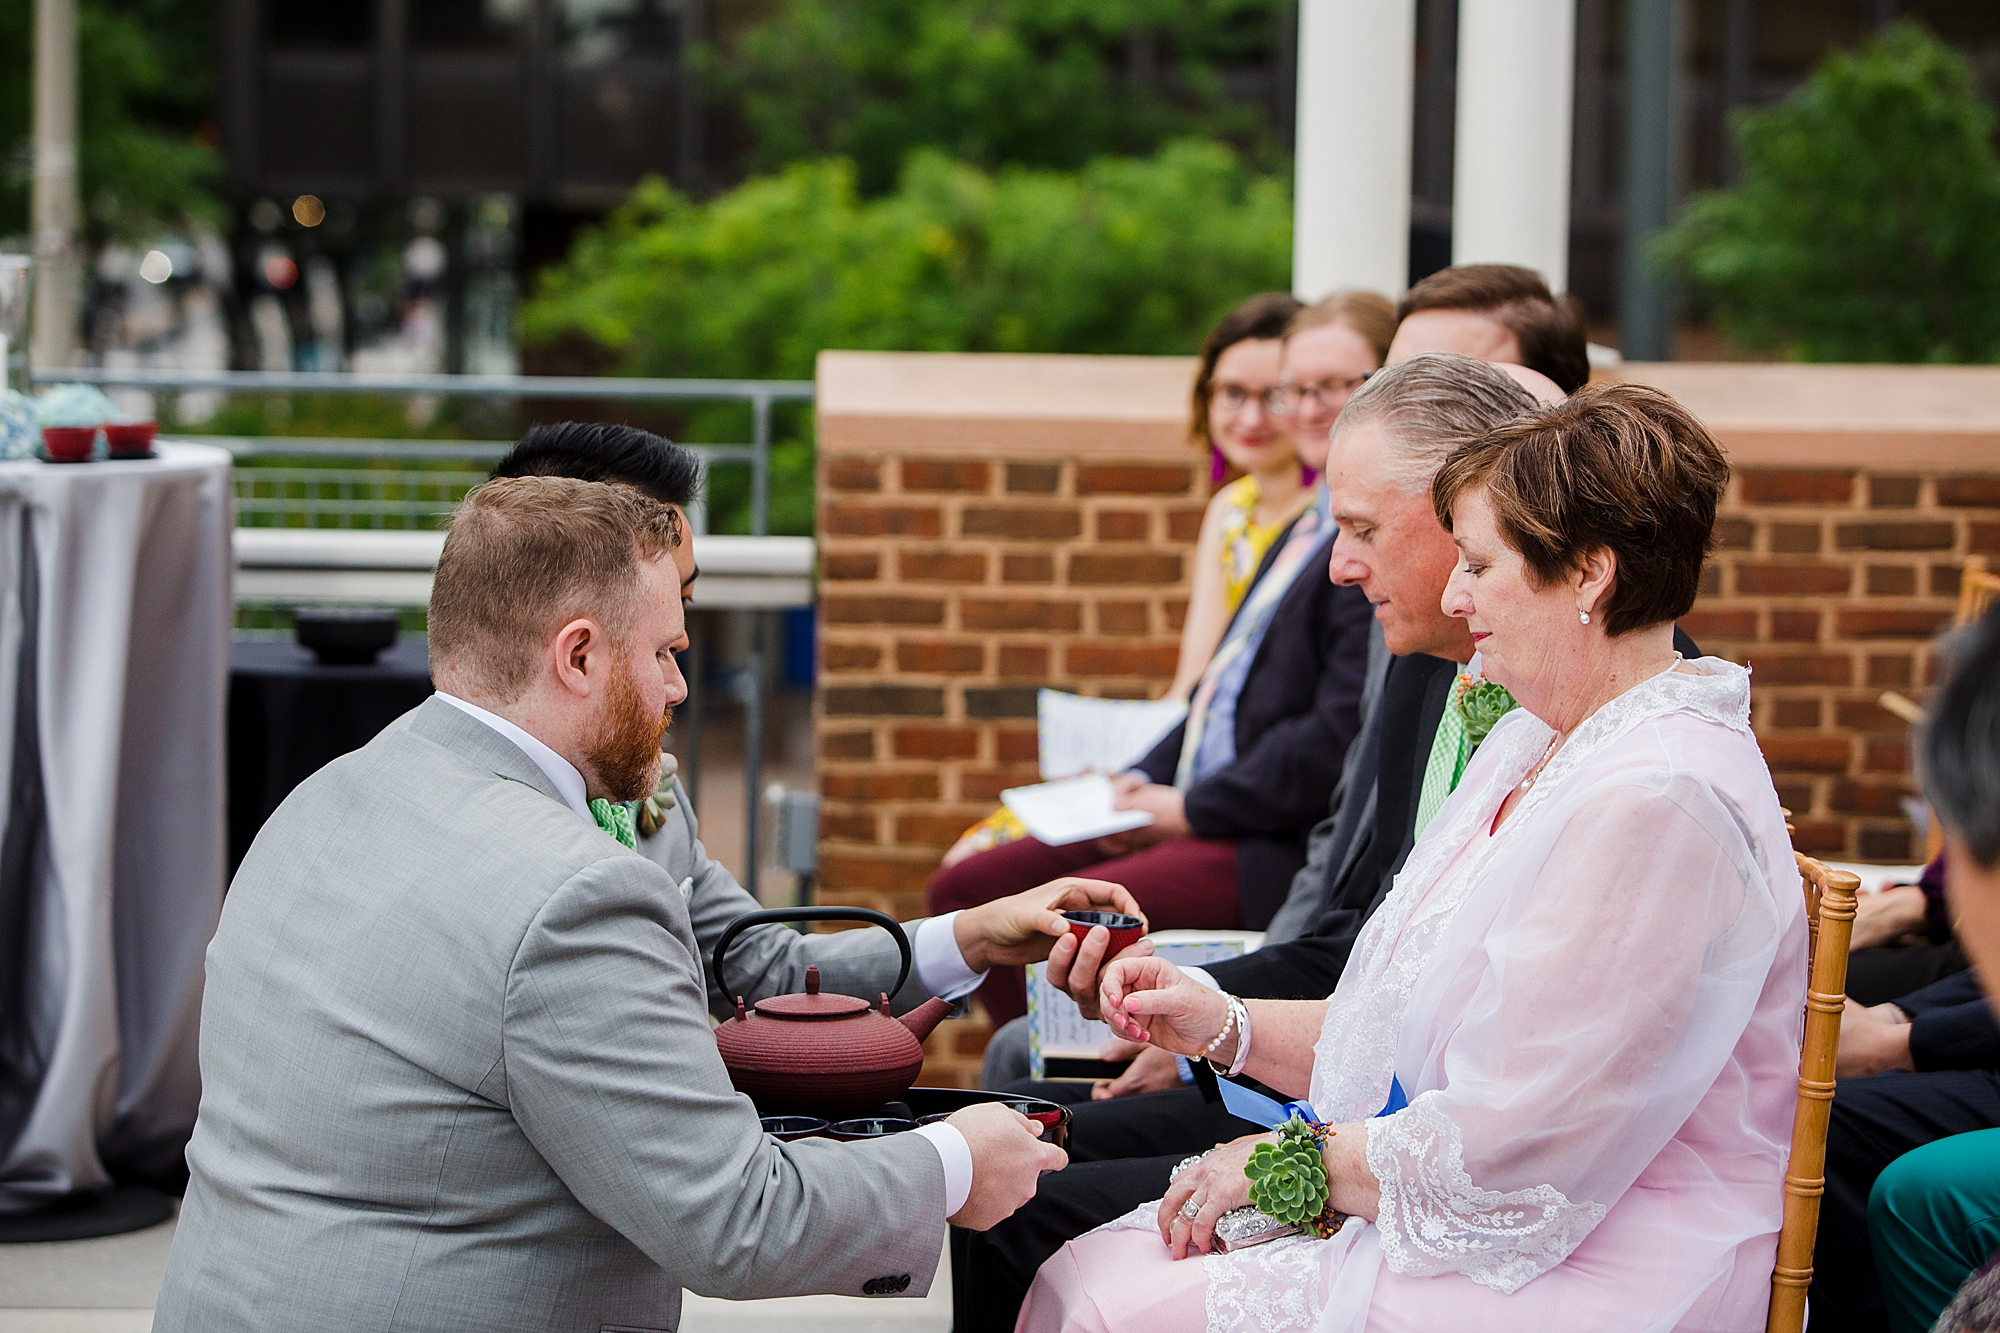 Dan_and_Byron_Love_by_Joe_Mac_Philadelphia_Wedding_LGBTQ_Photography_Gay_Independence_visitor_Center_89.JPG